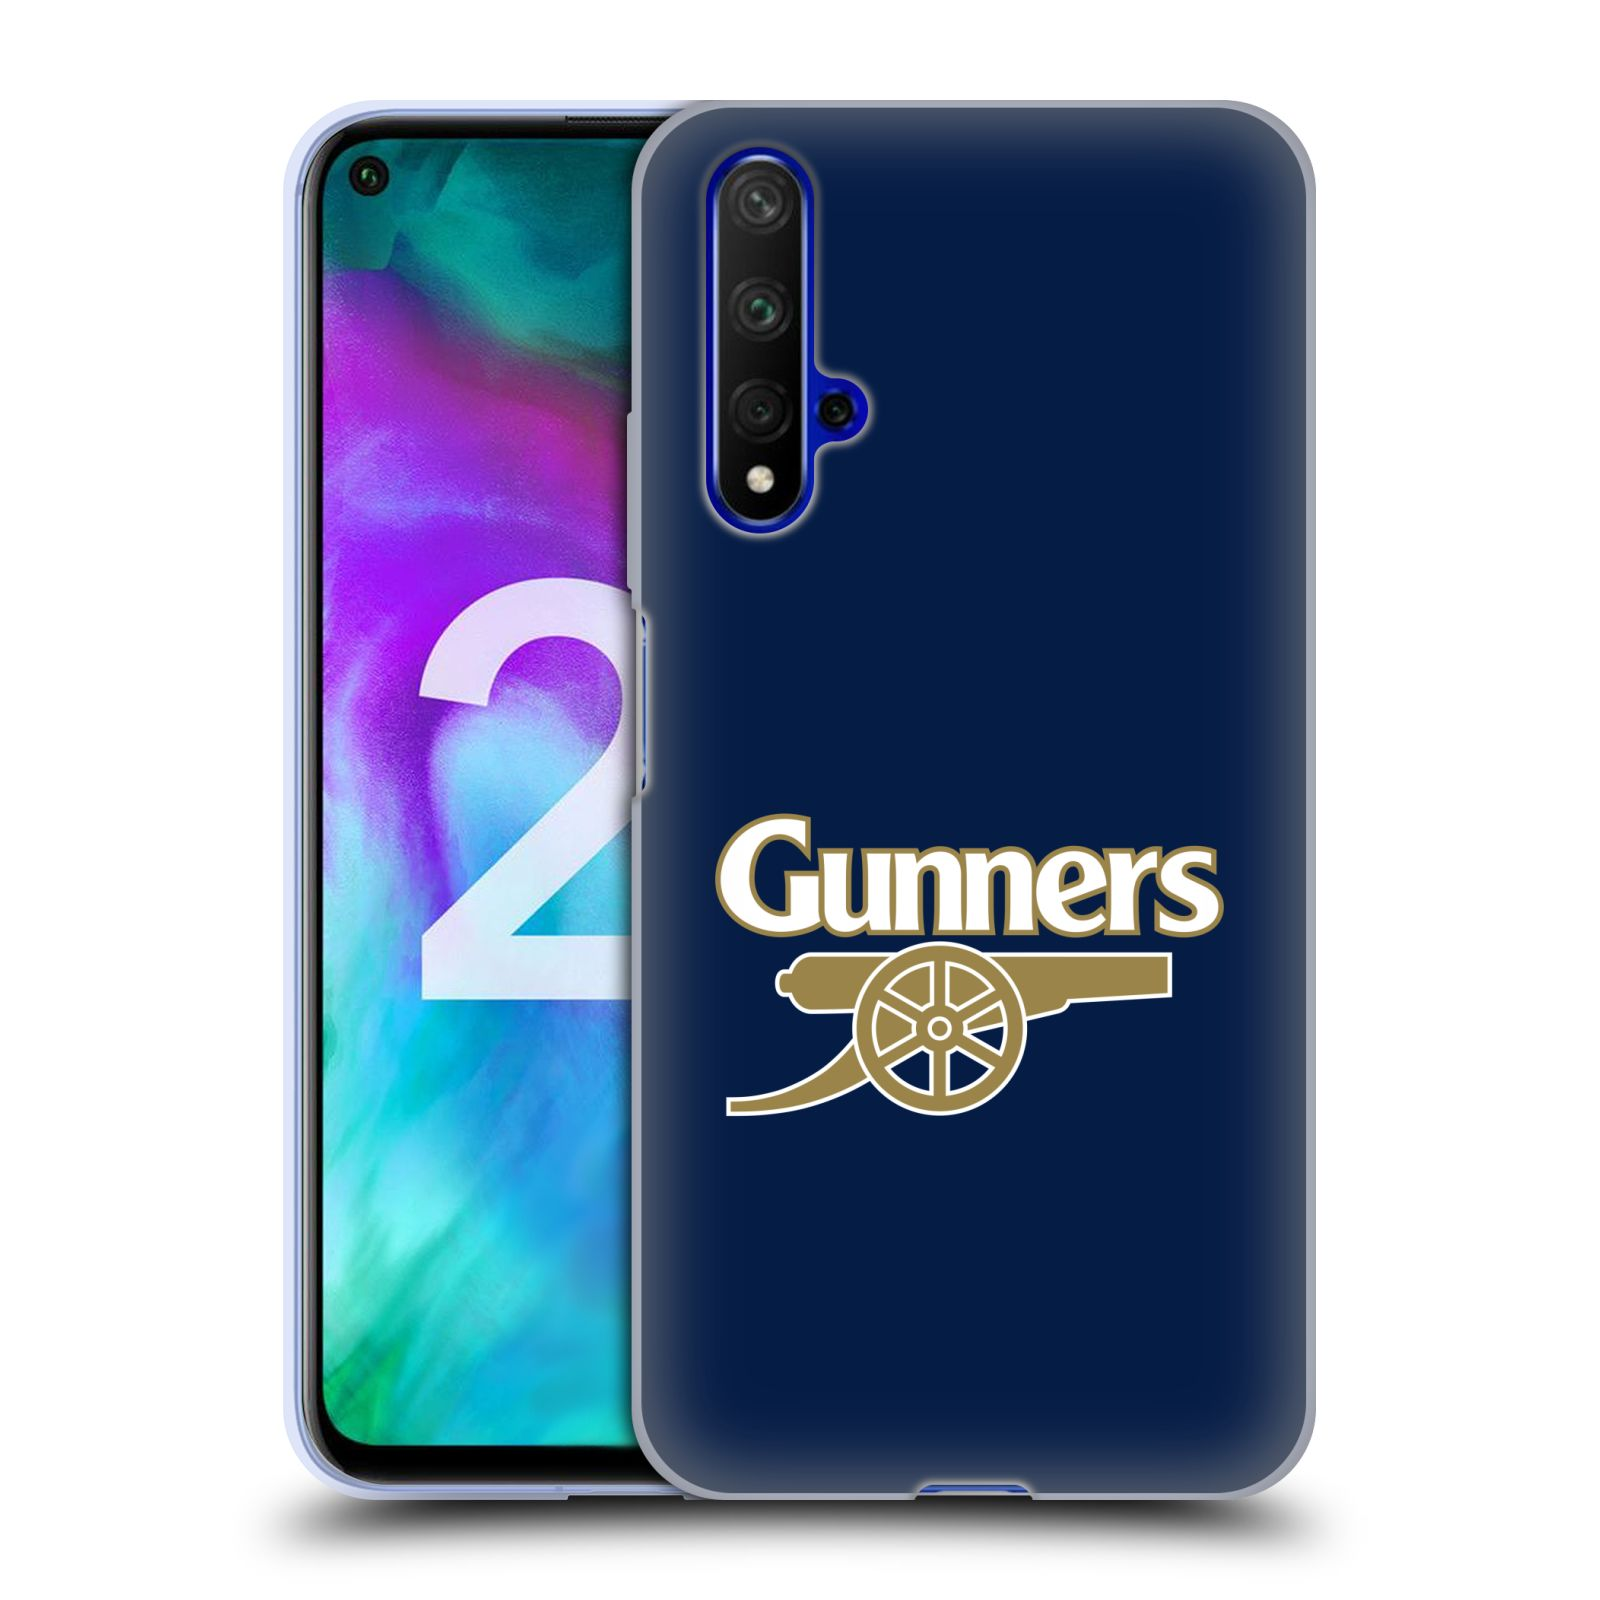 Silikonové pouzdro na mobil Honor 20 - Head Case - Arsenal FC - Gunners